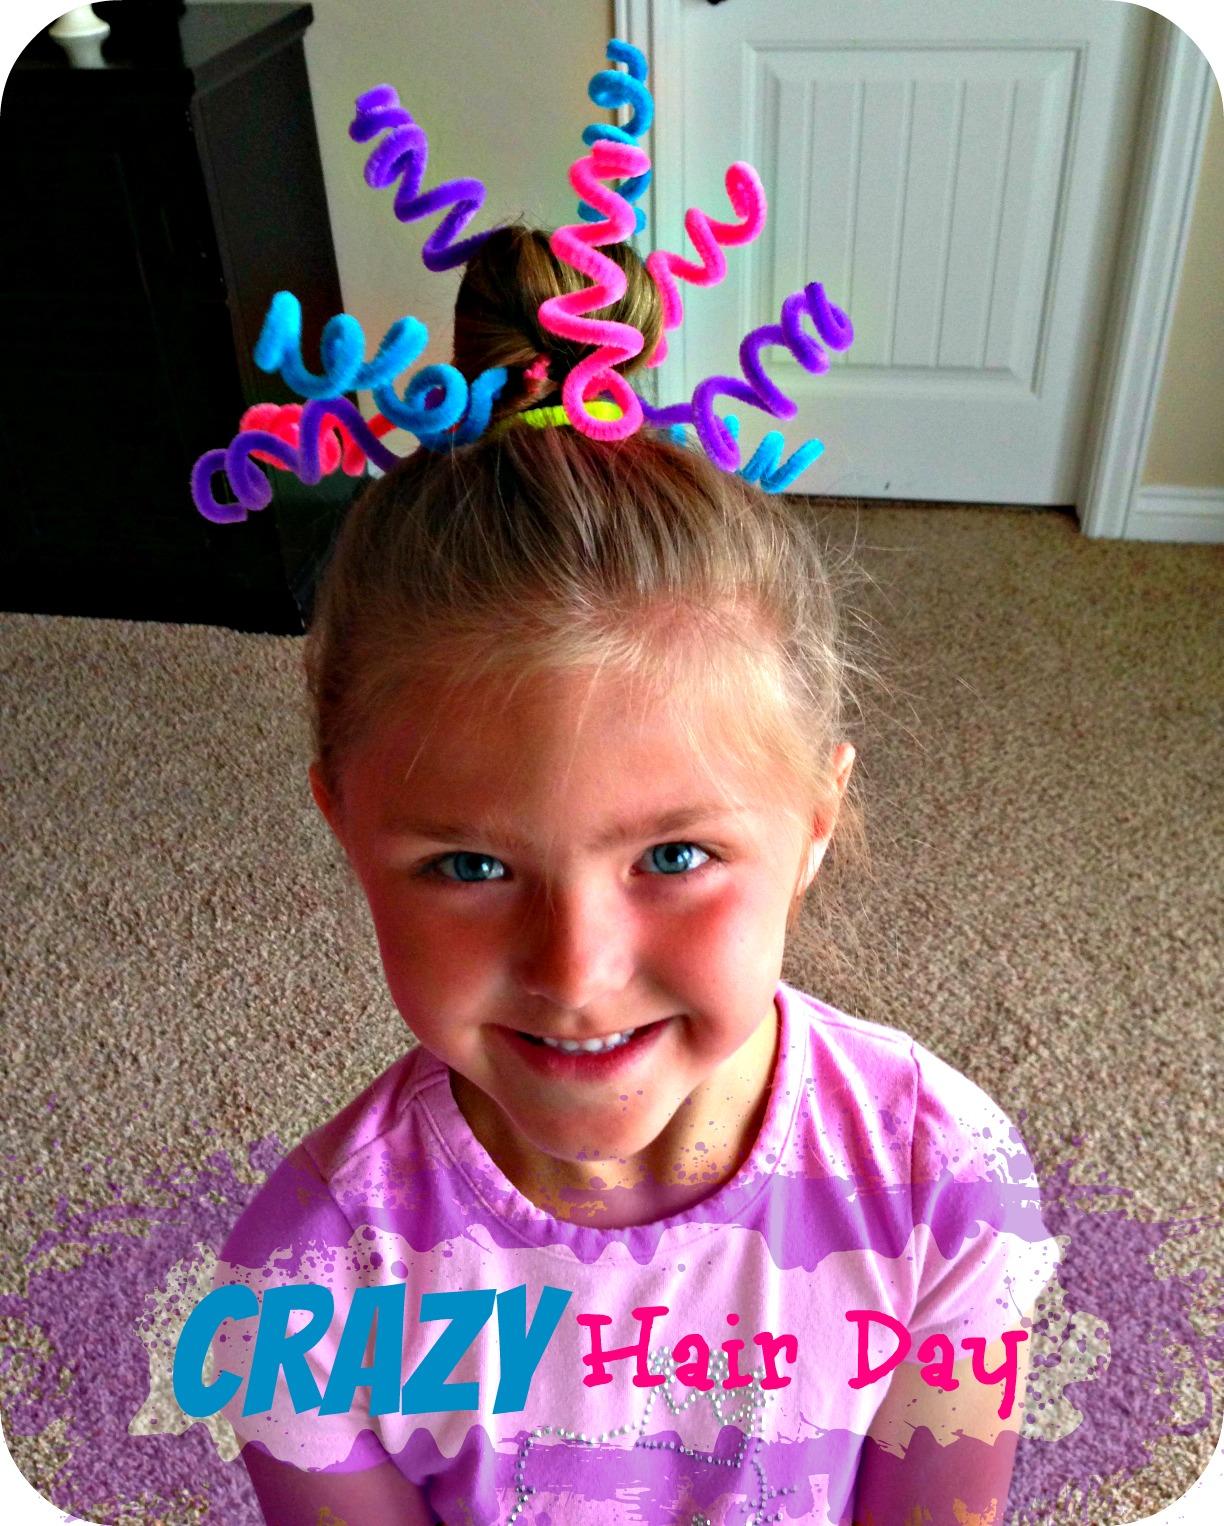 Crazy Hair Day Ideas!  sc 1 st  Blue Skies Ahead & Blue Skies Ahead: Crazy Hair Day Ideas!